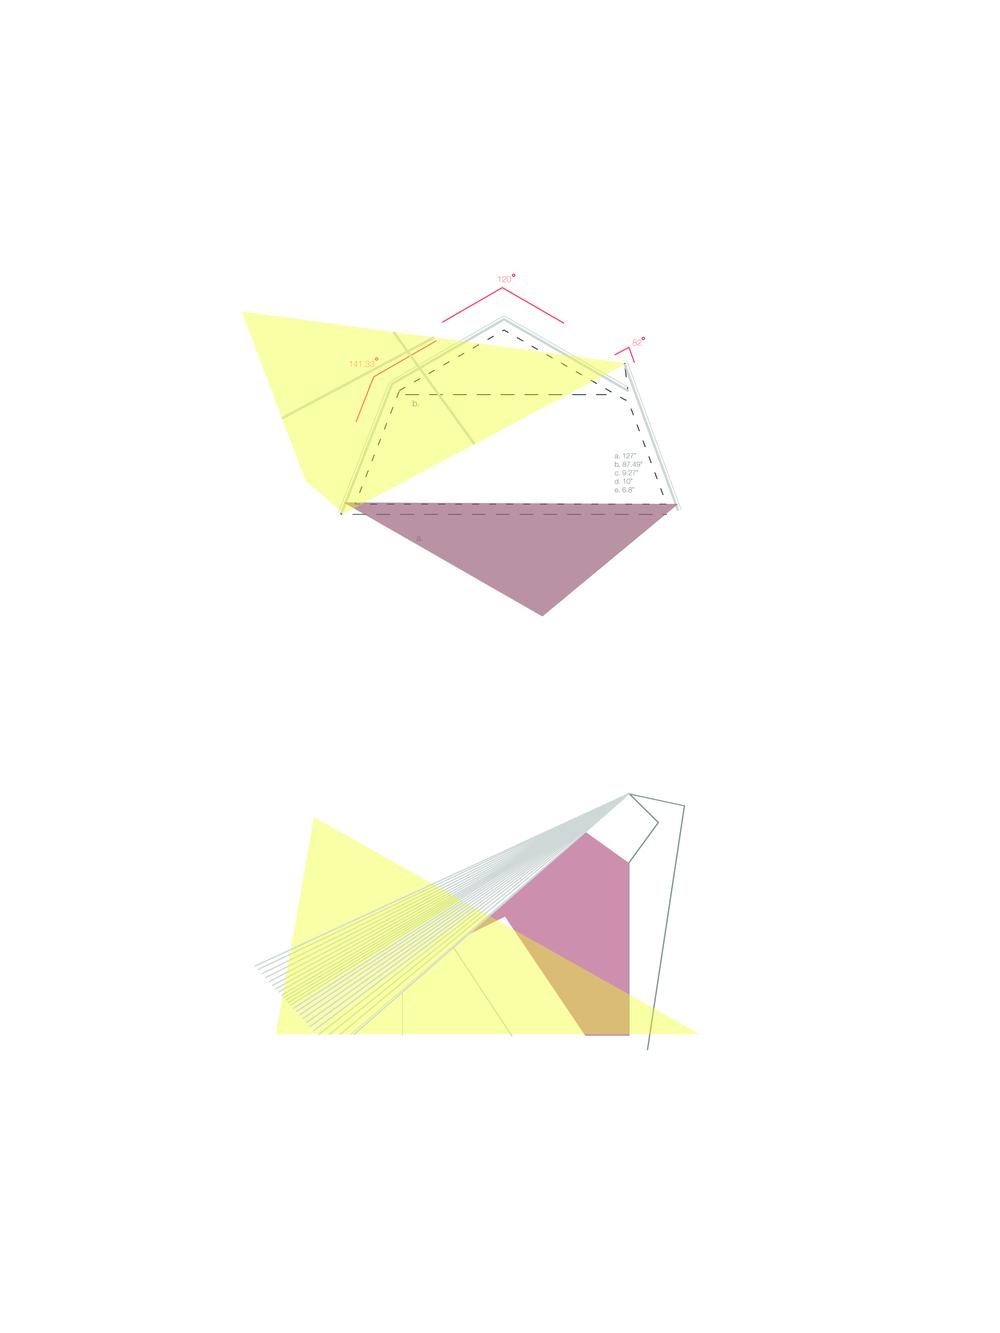 Floorplan-01.jpg